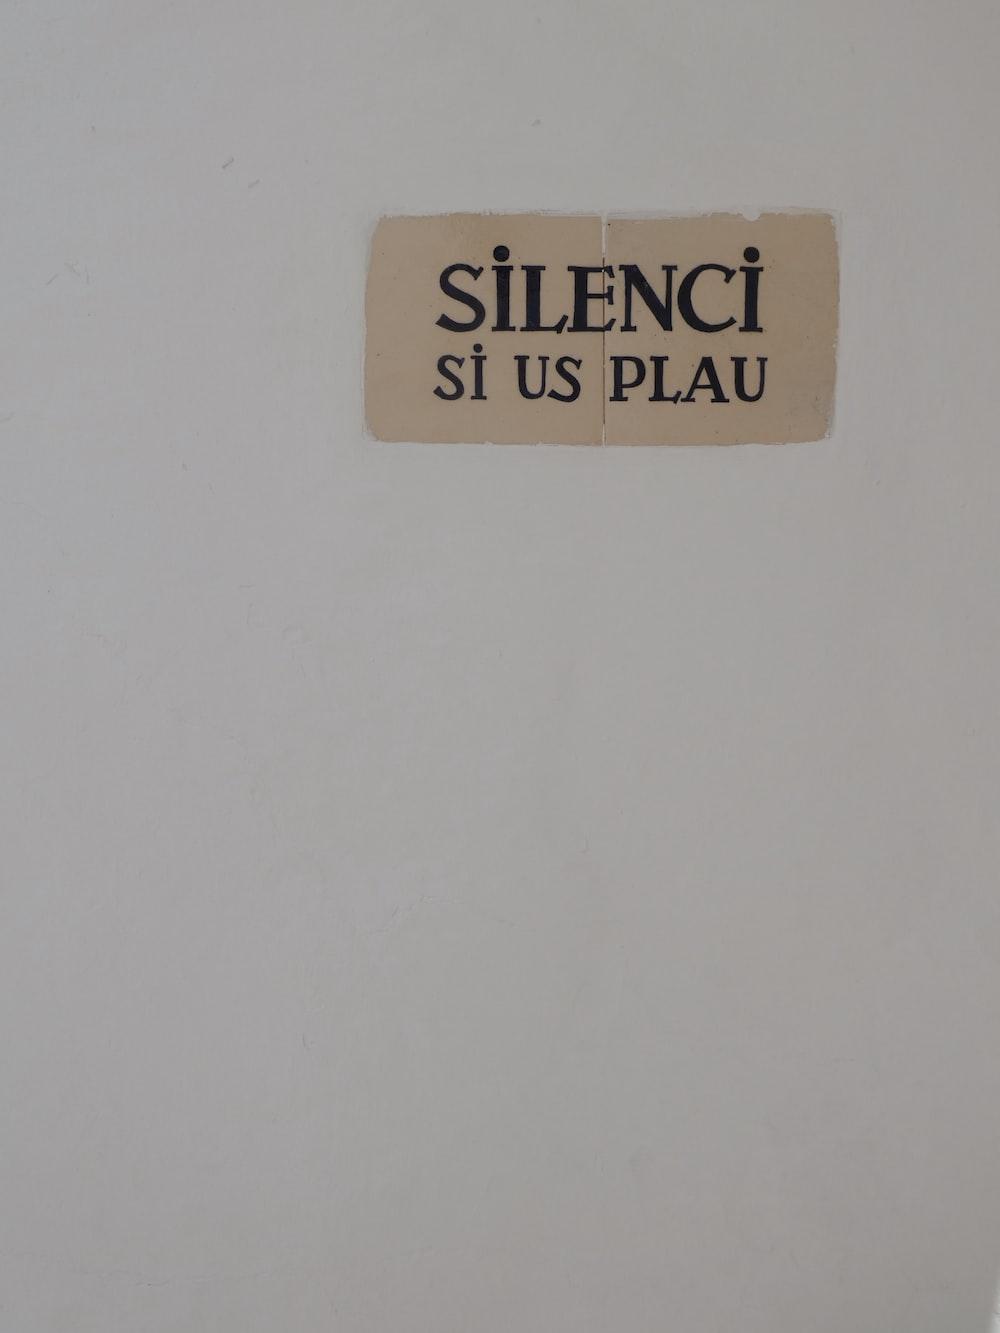 silenci si us plau signage